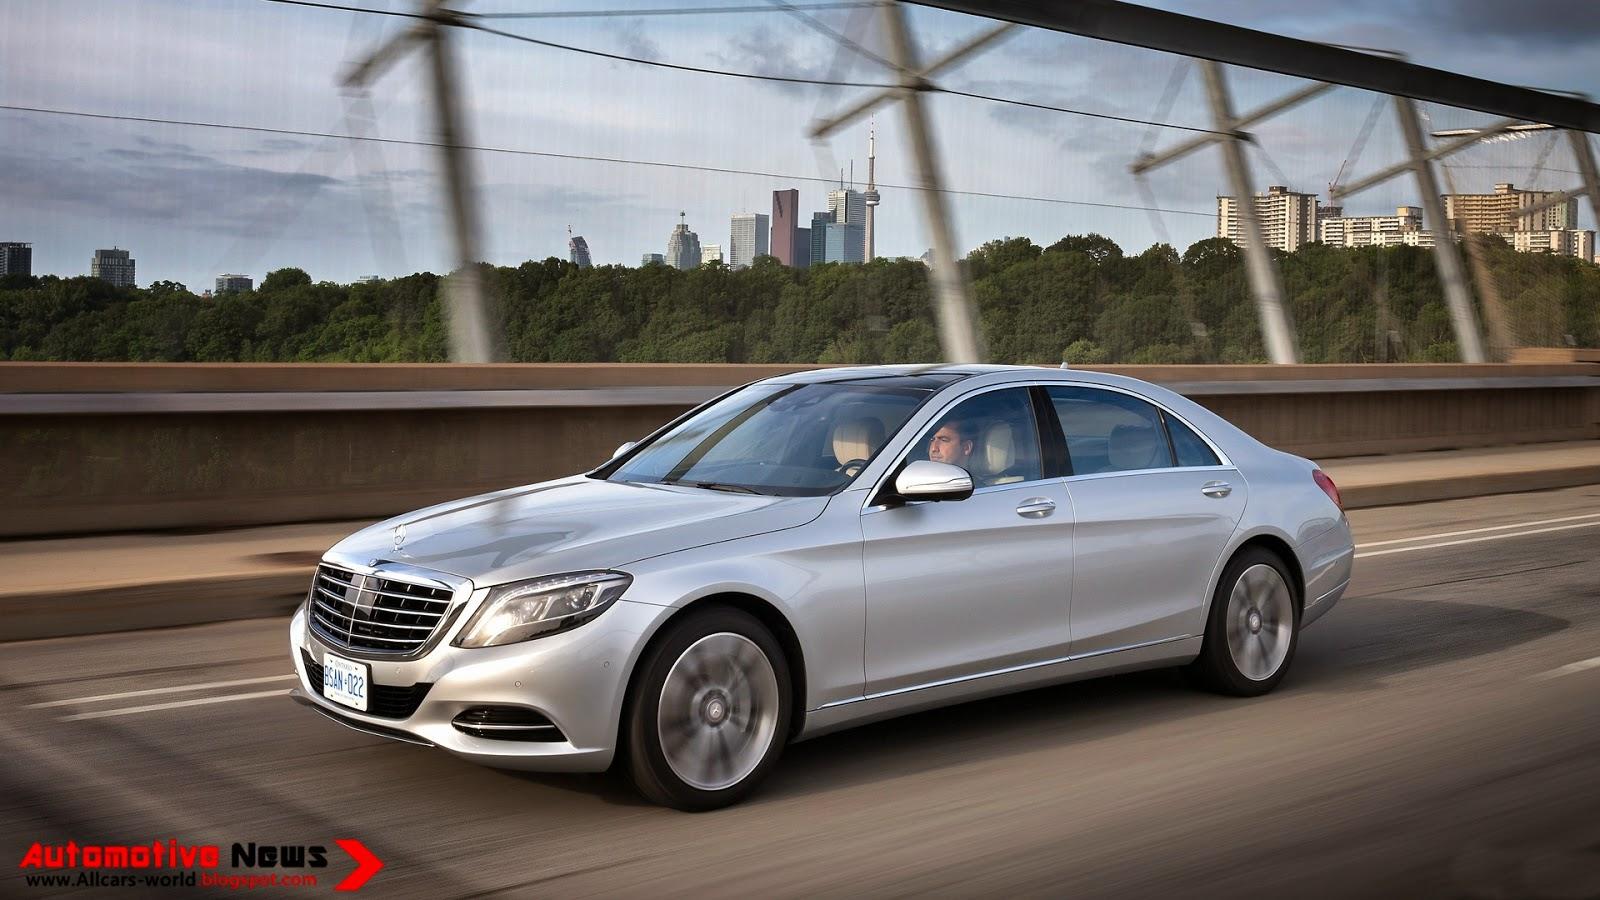 Automotive news 2014 mercedes benz s class review for 2014 mercedes benz s550